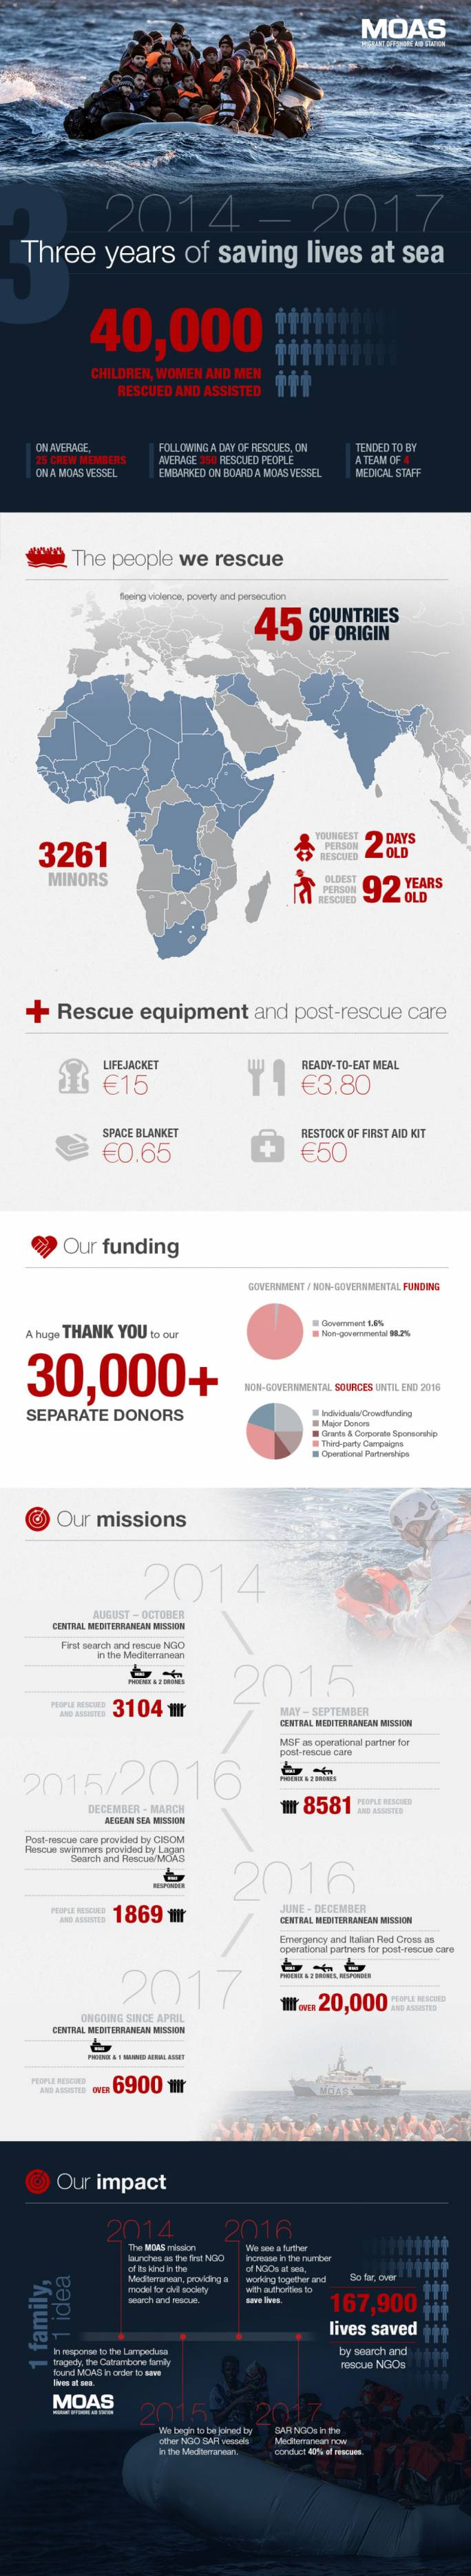 Three Years of Saving Lives At Sea Image: MOAS/Malta Today